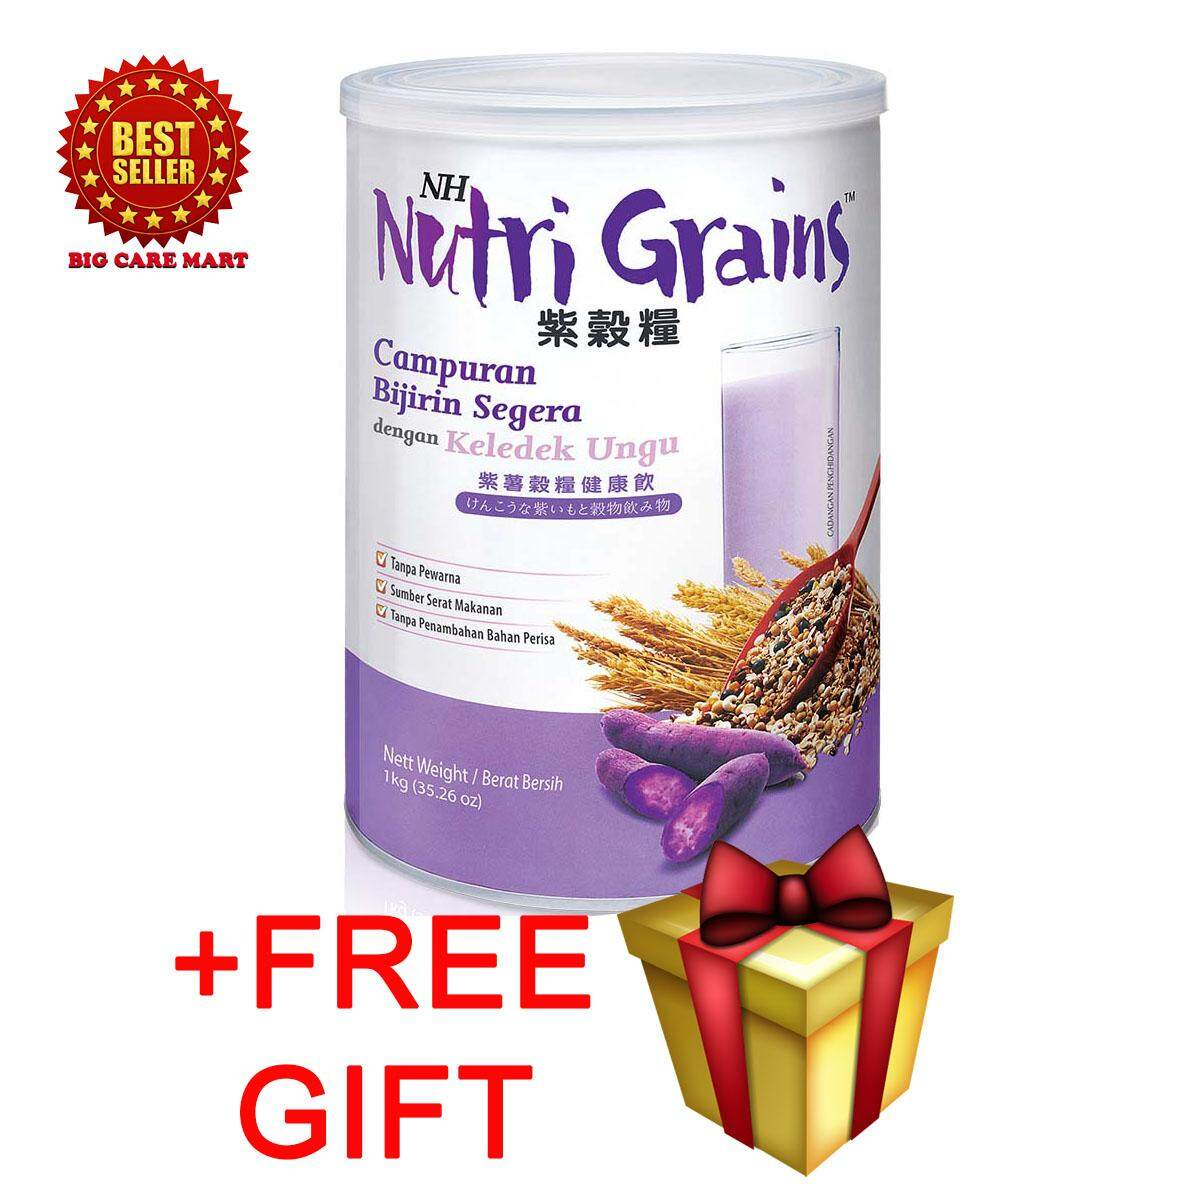 NH Nutri Grains with Purple Sweet Potato 1kg + FREE GIFT